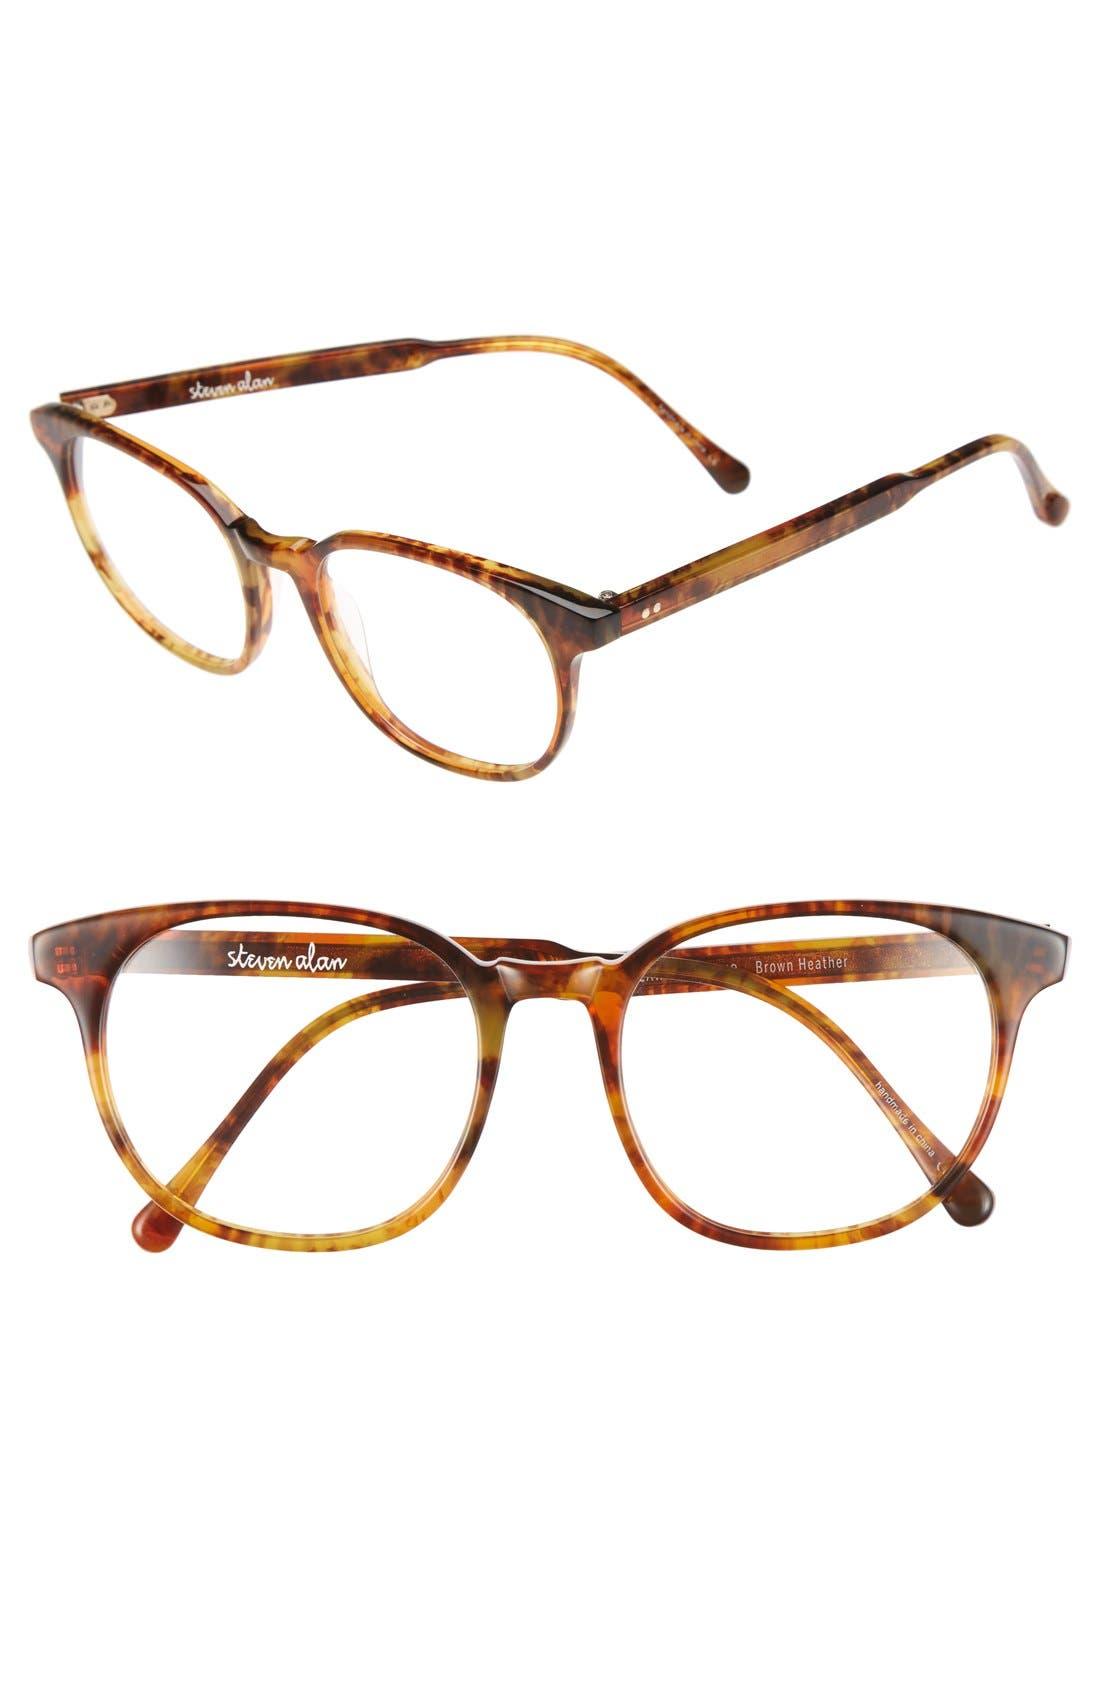 Alternate Image 1 Selected - Steven Alan 'High Lawn' 52mm Optical Glasses